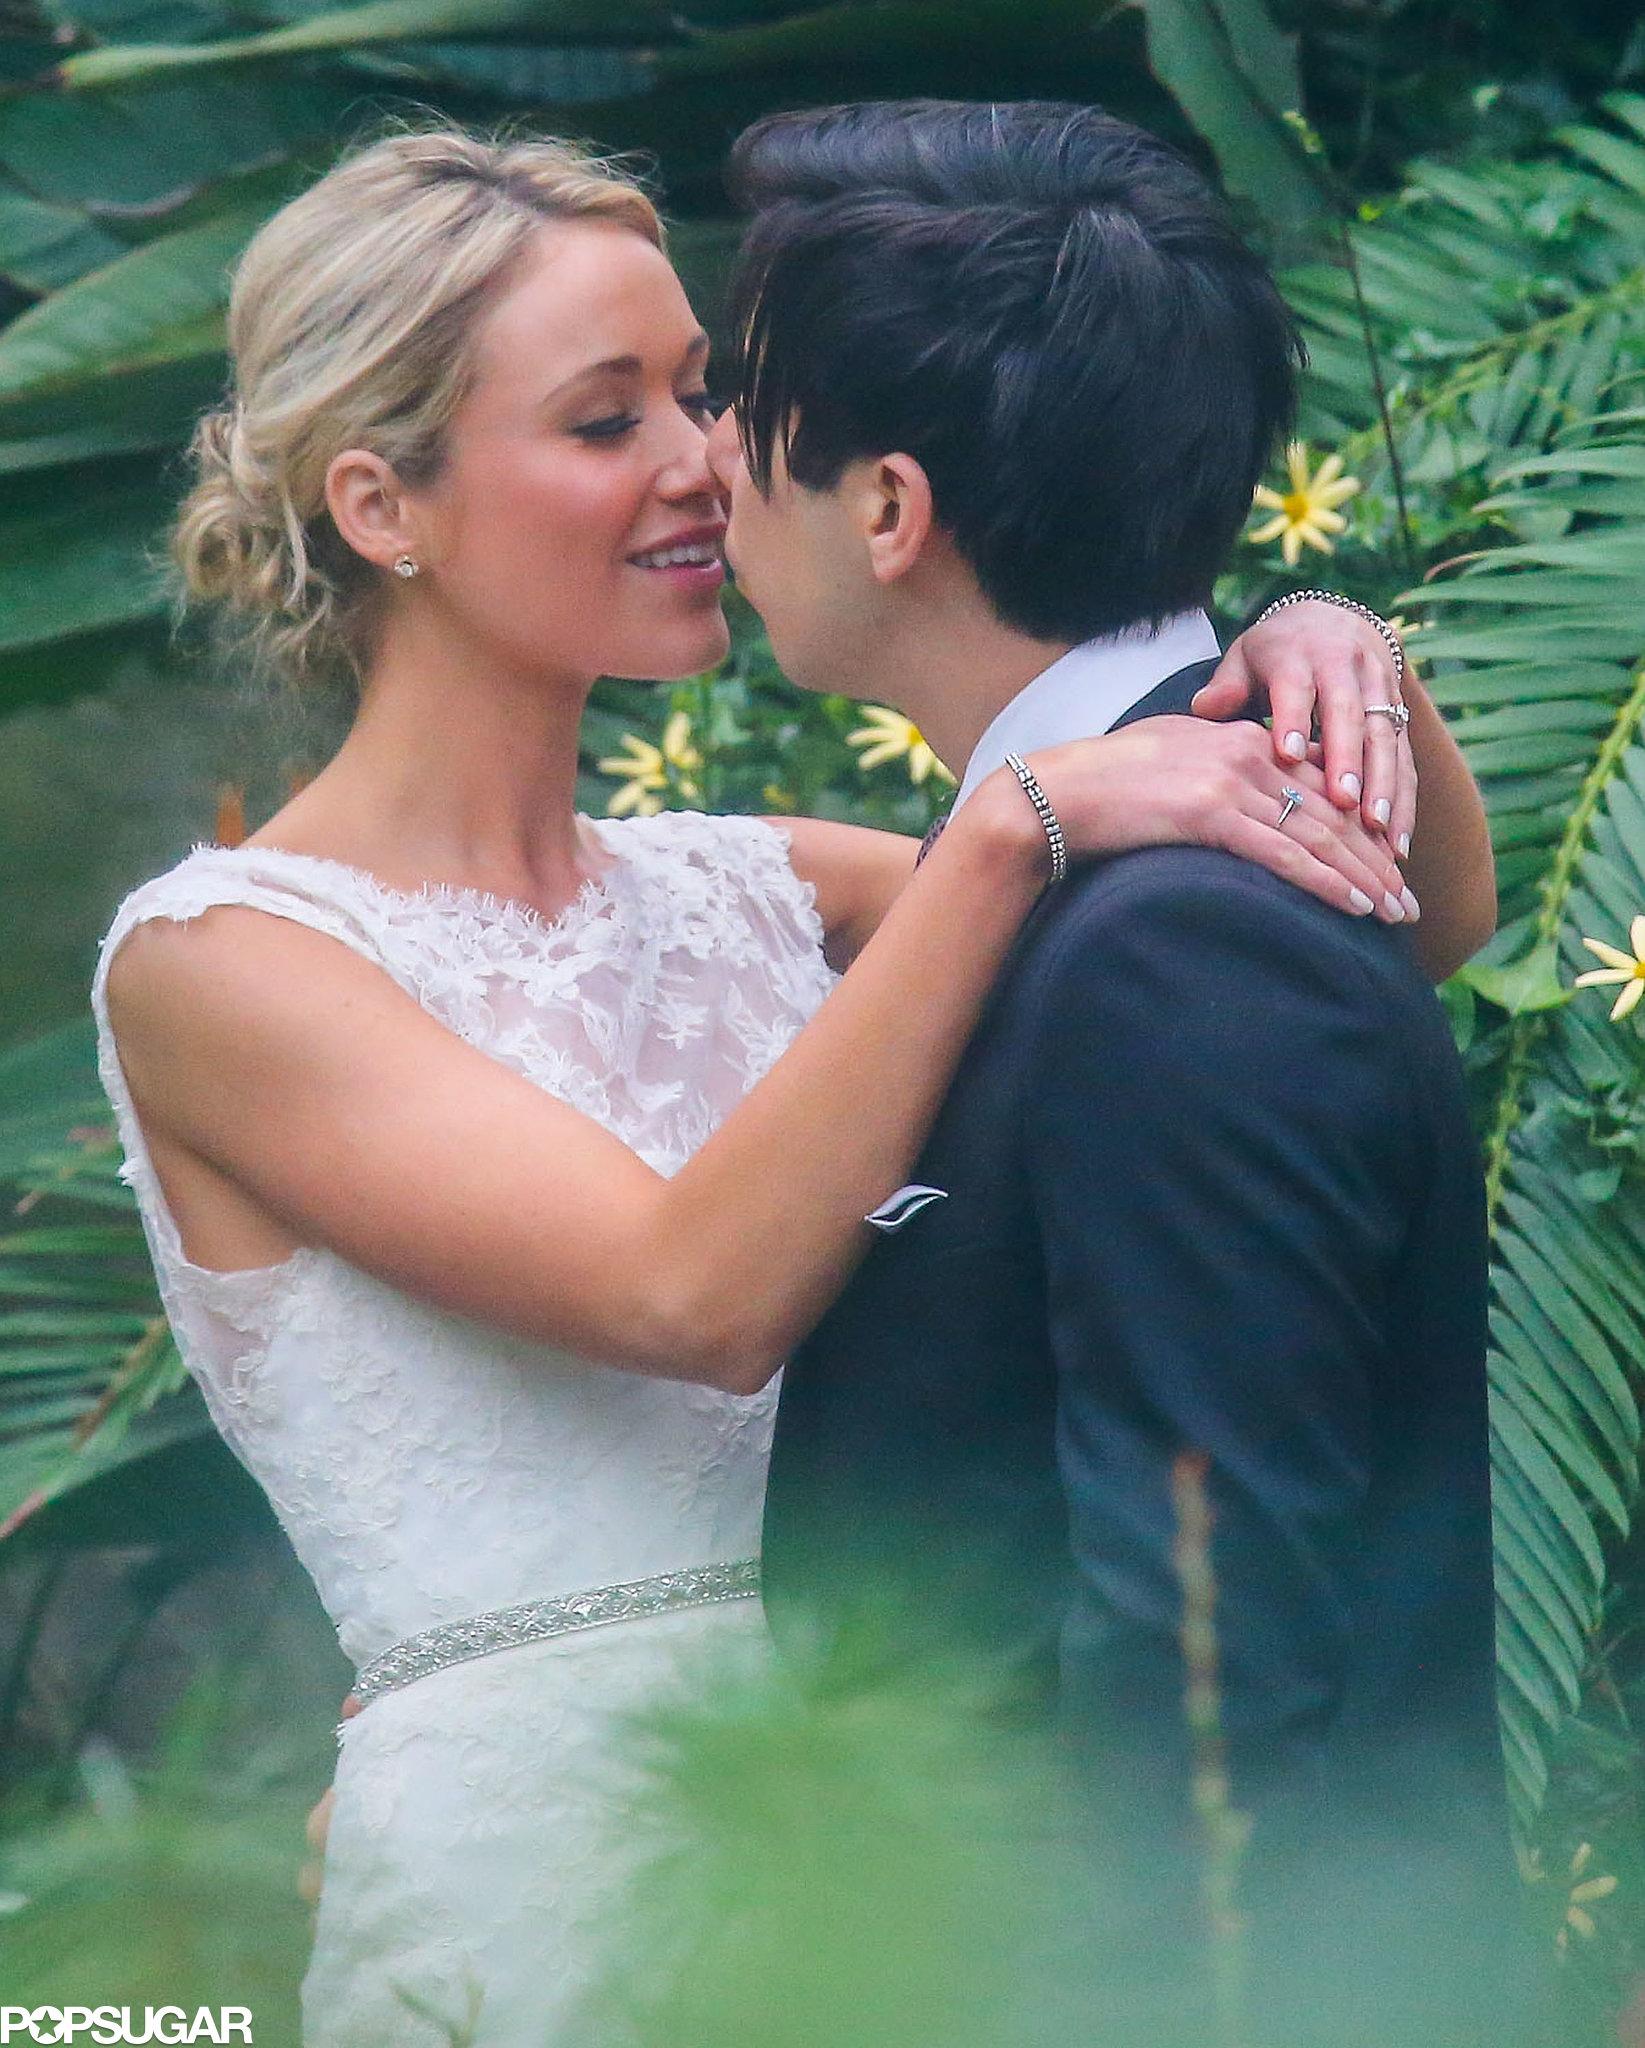 Katrina Bowden and Ben Jorgensen kissed at their Brooklyn wedding.